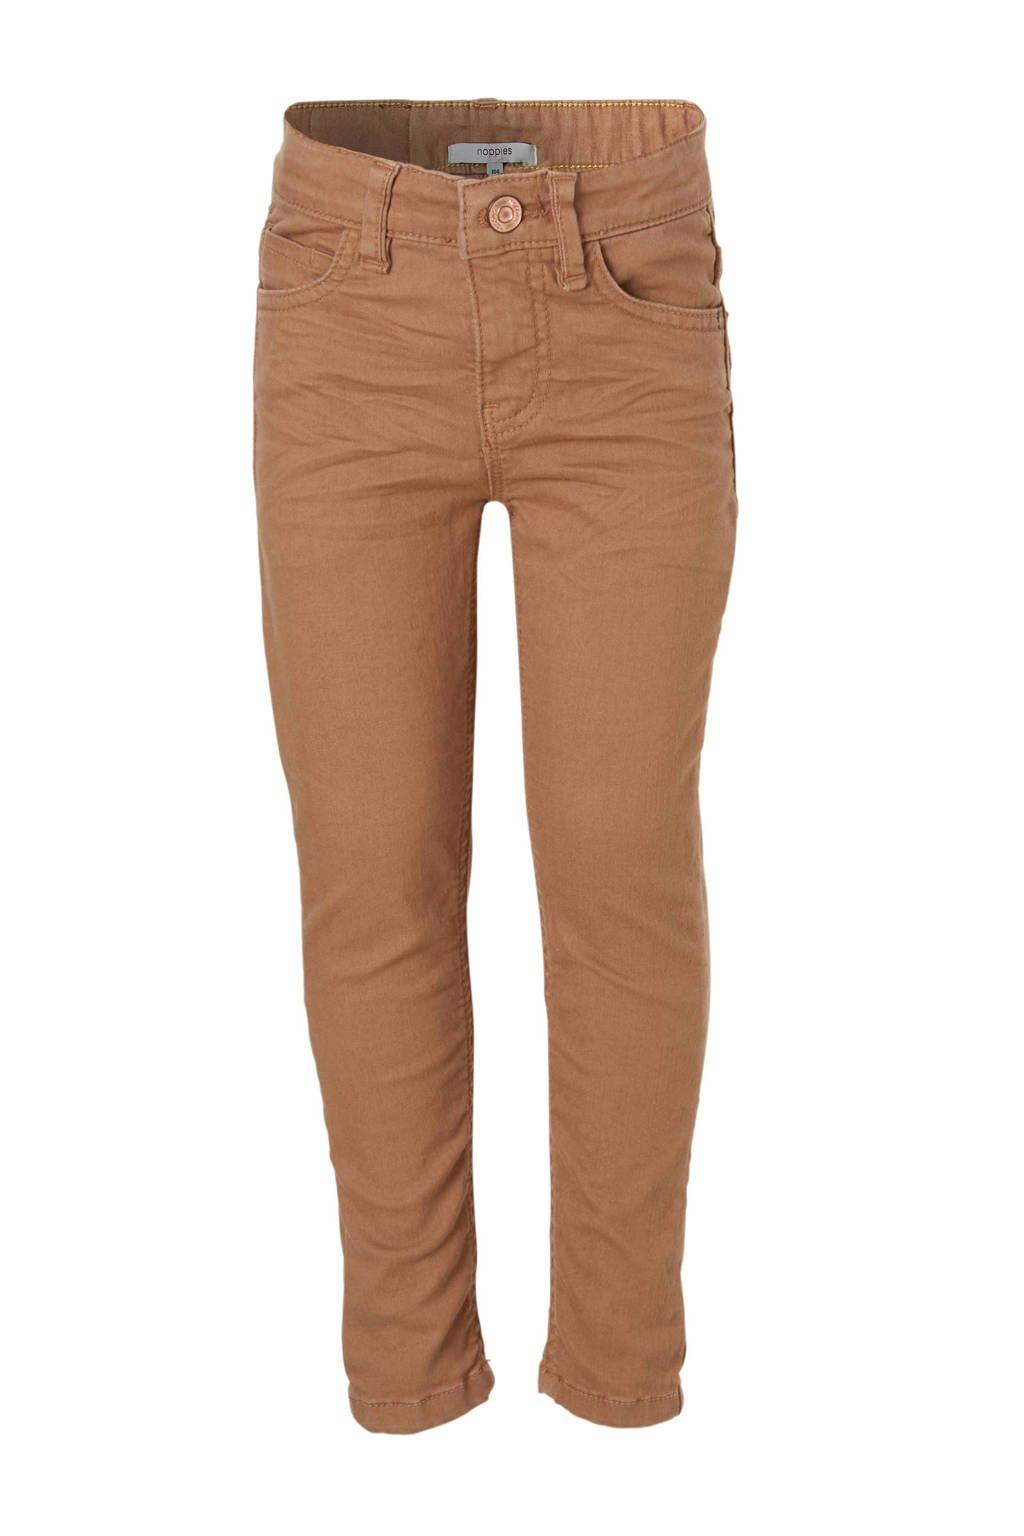 Noppies slim fit jeans Paragould, Lichtbruin